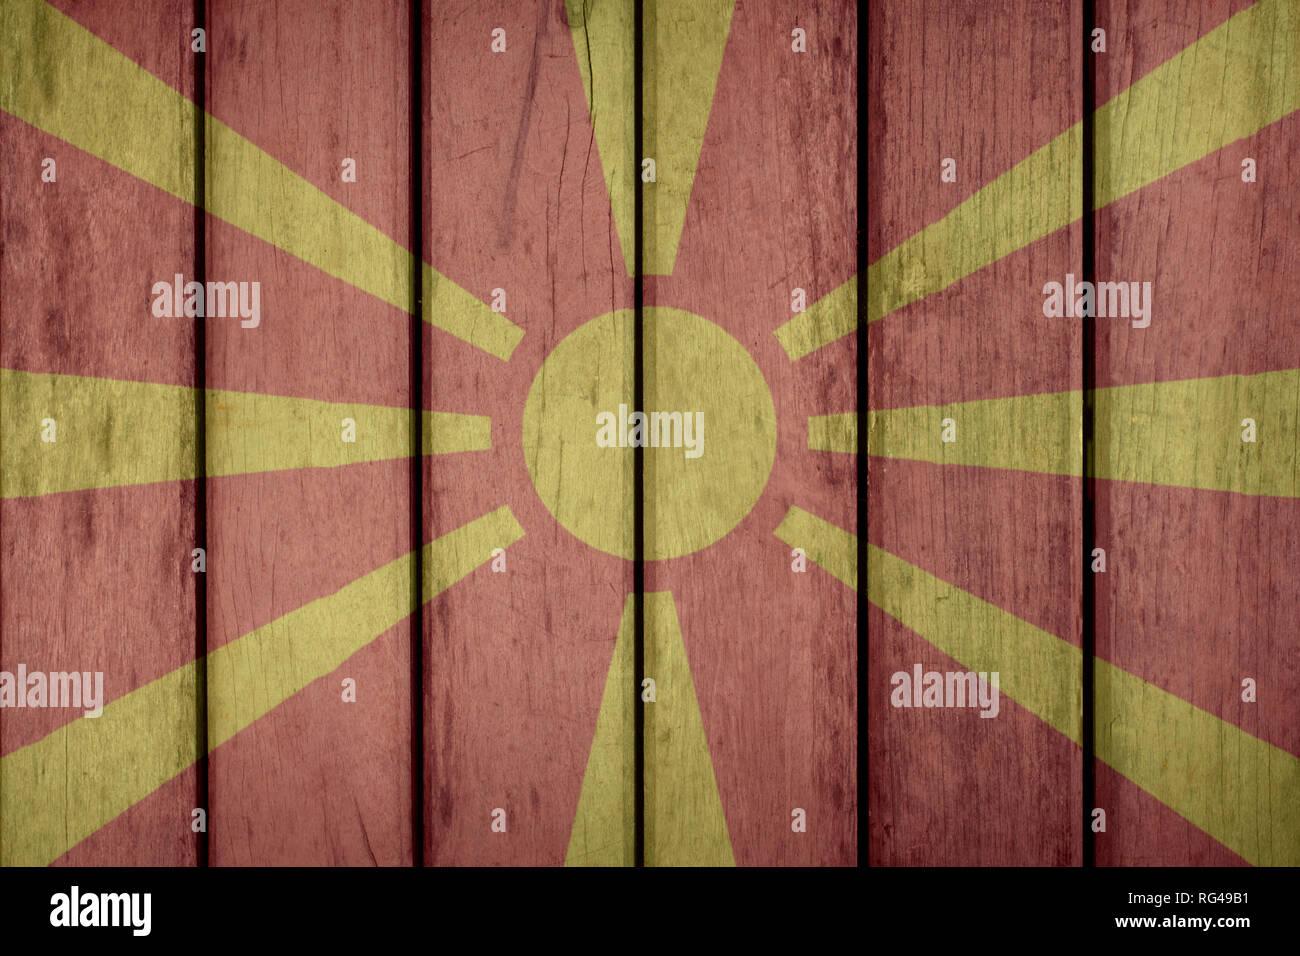 Macedonia Politics News Concept: Macedonian Flag Wooden Fence - Stock Image